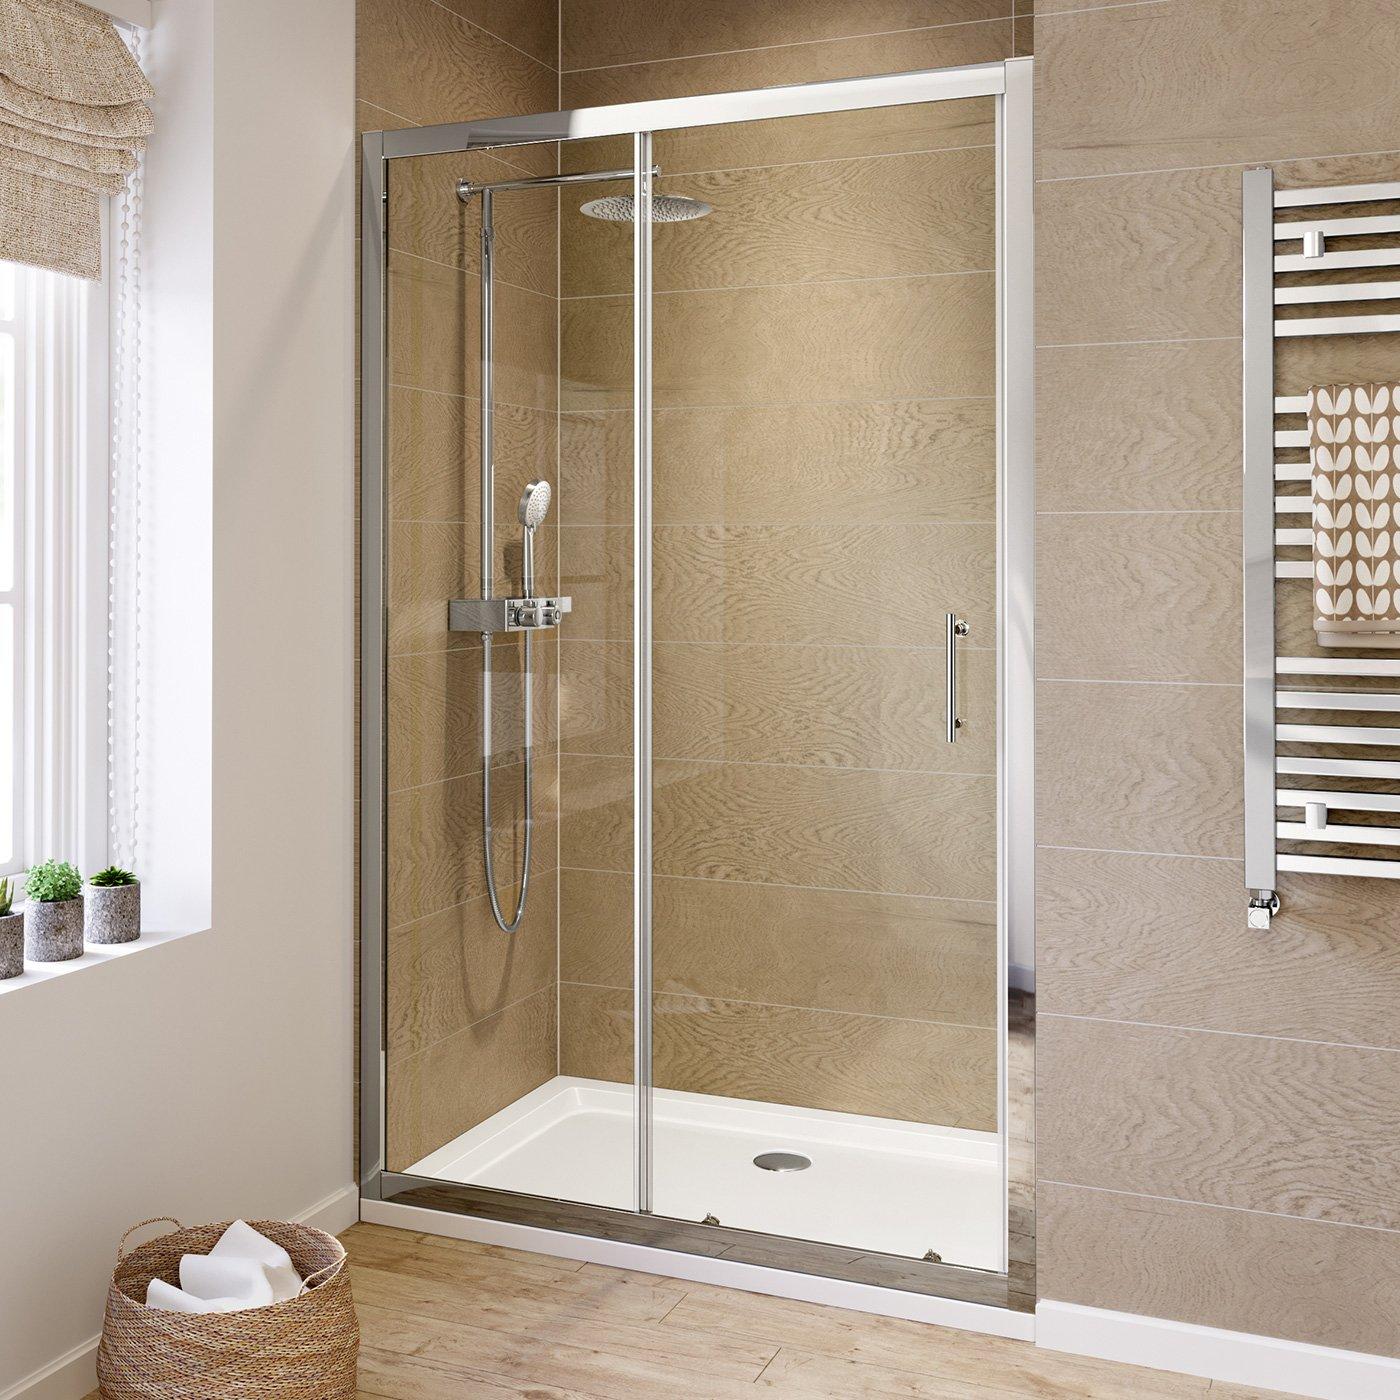 Ibathuk 1200mm Modern Sliding 6mm Glass Shower Enclosure Reversible